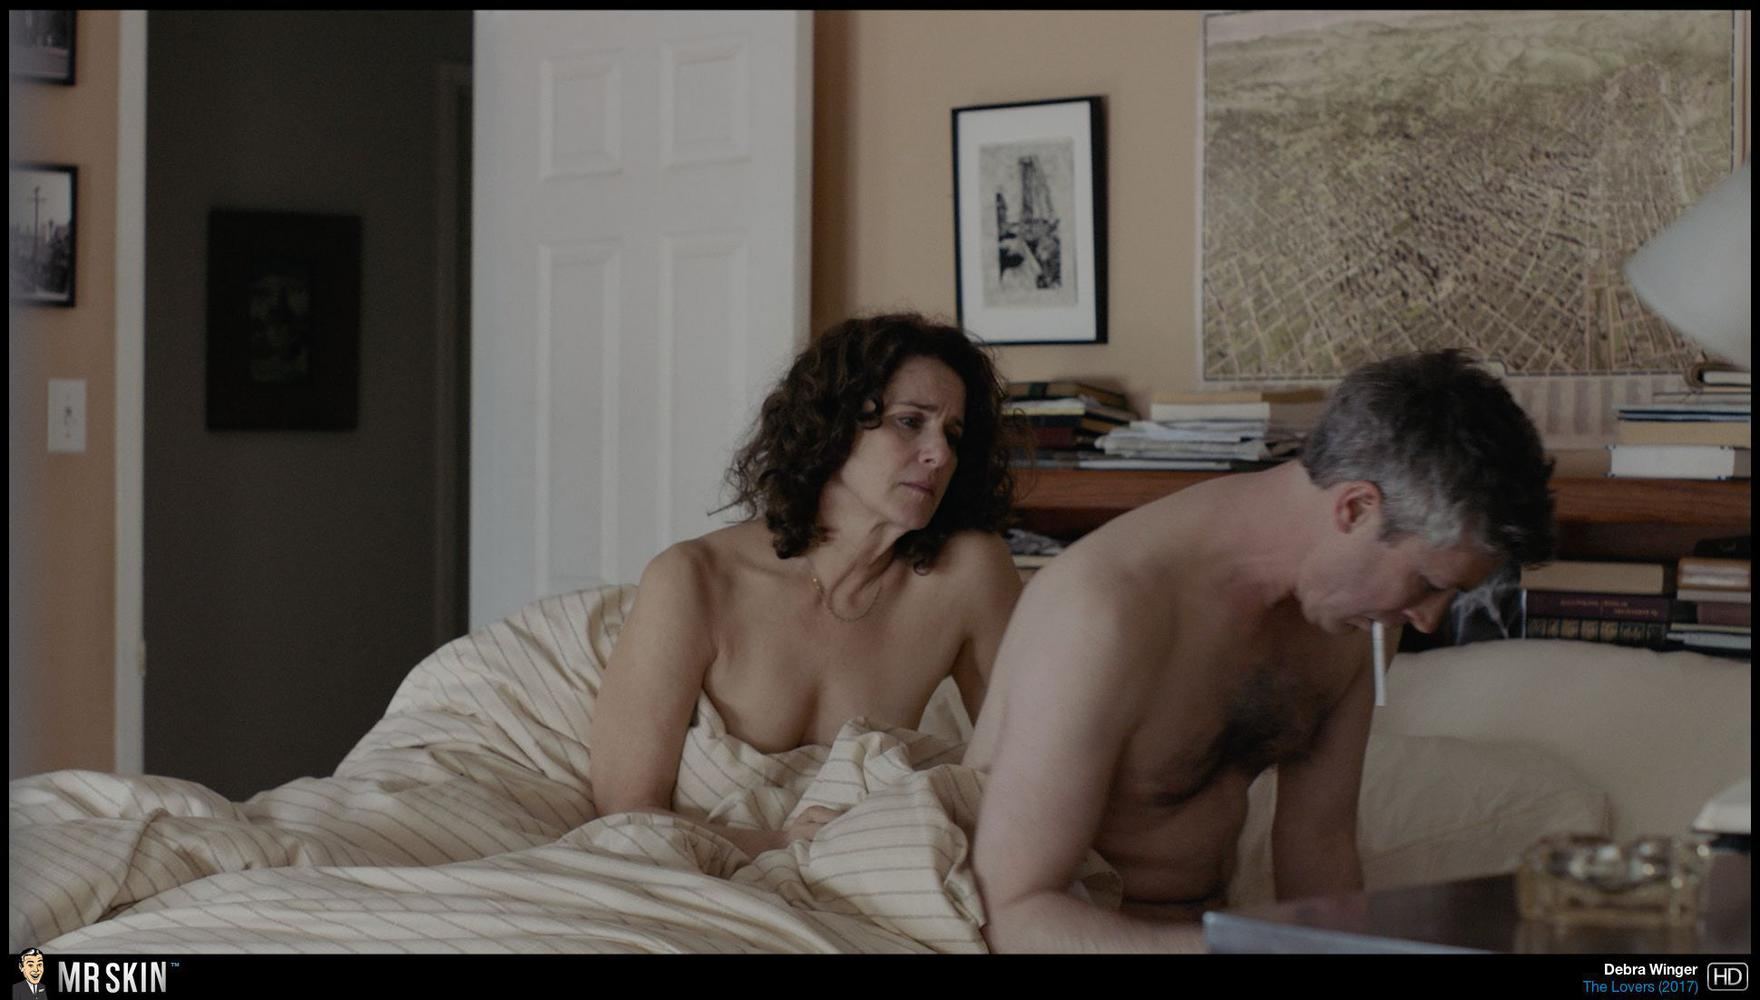 Free download you porn debra winger nude #6